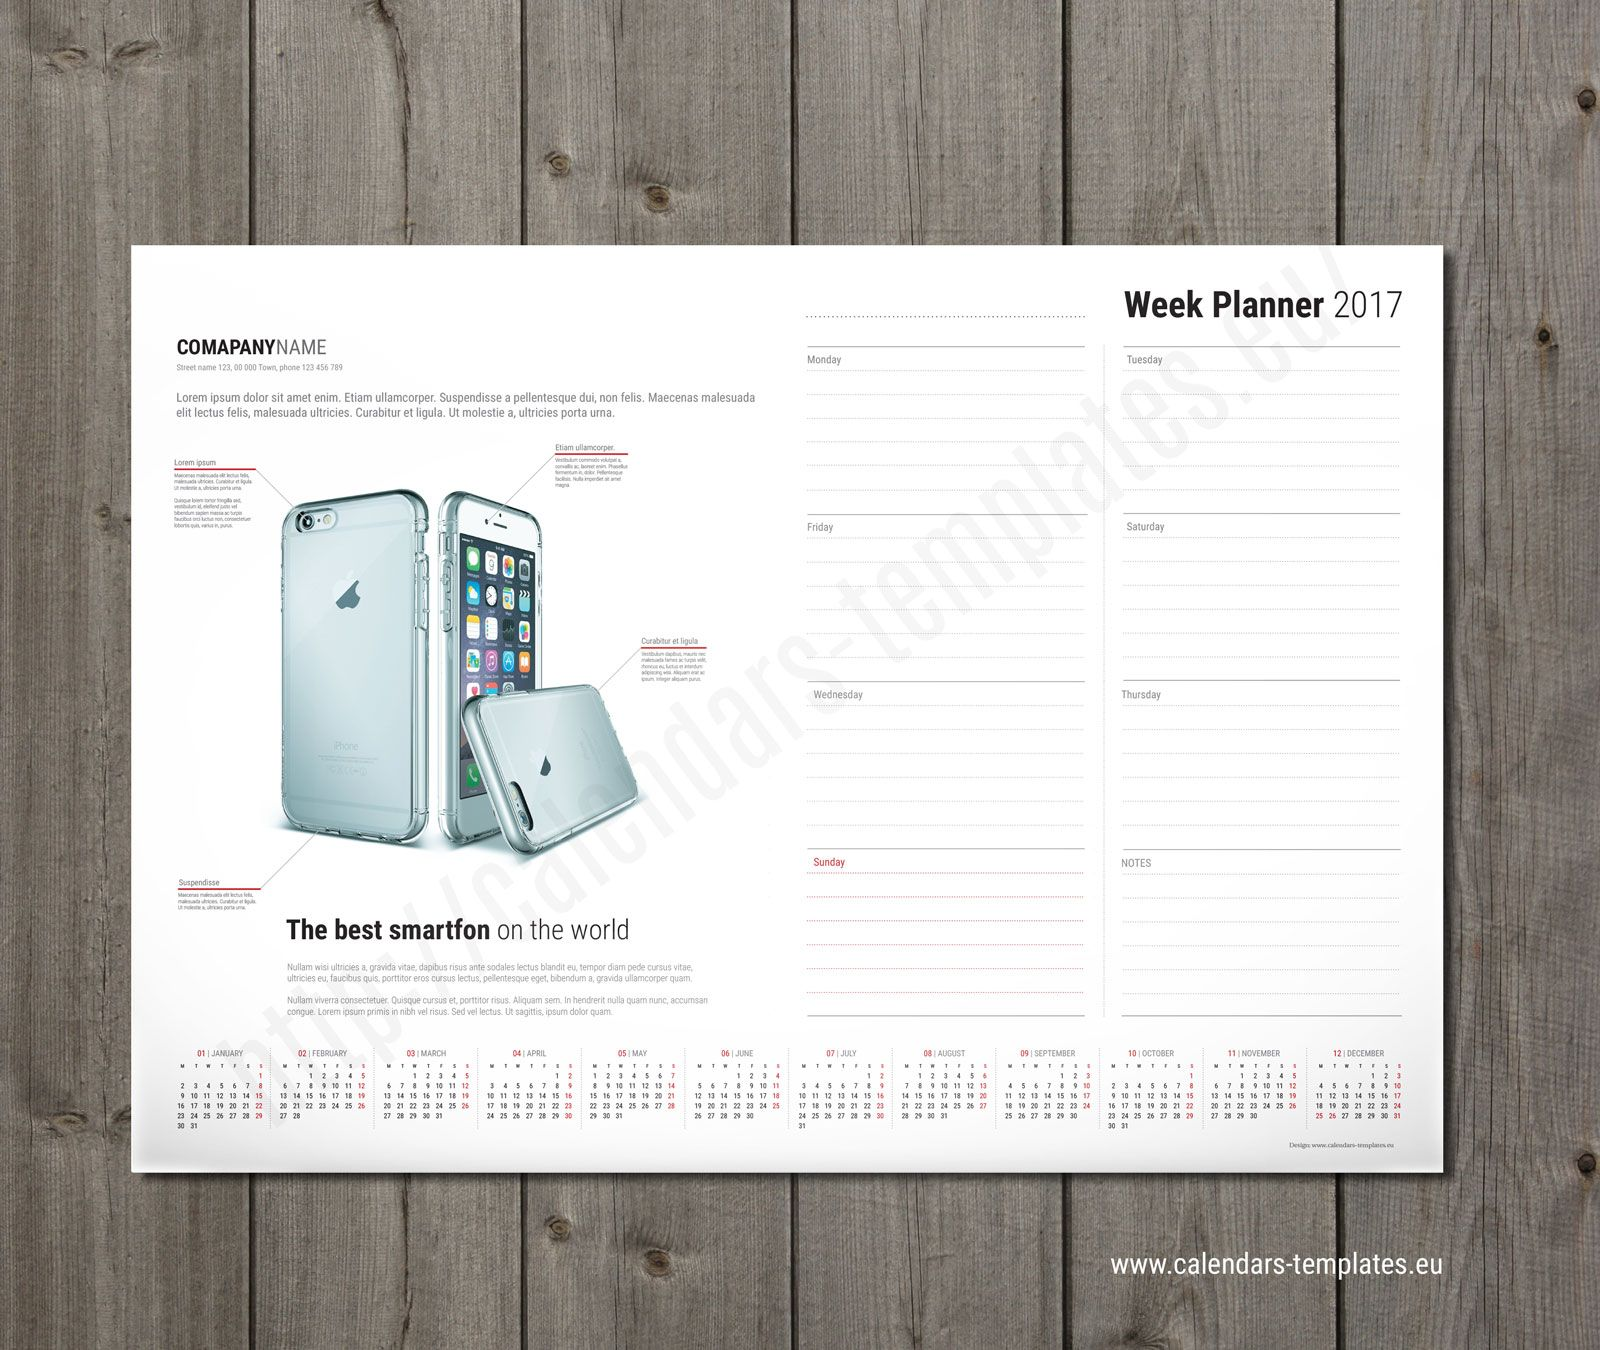 Agenda Planner, Weekly Planner, Weekly Agenda, Calendar Templates,  Planners, Self, Schedule Templates, Organizers